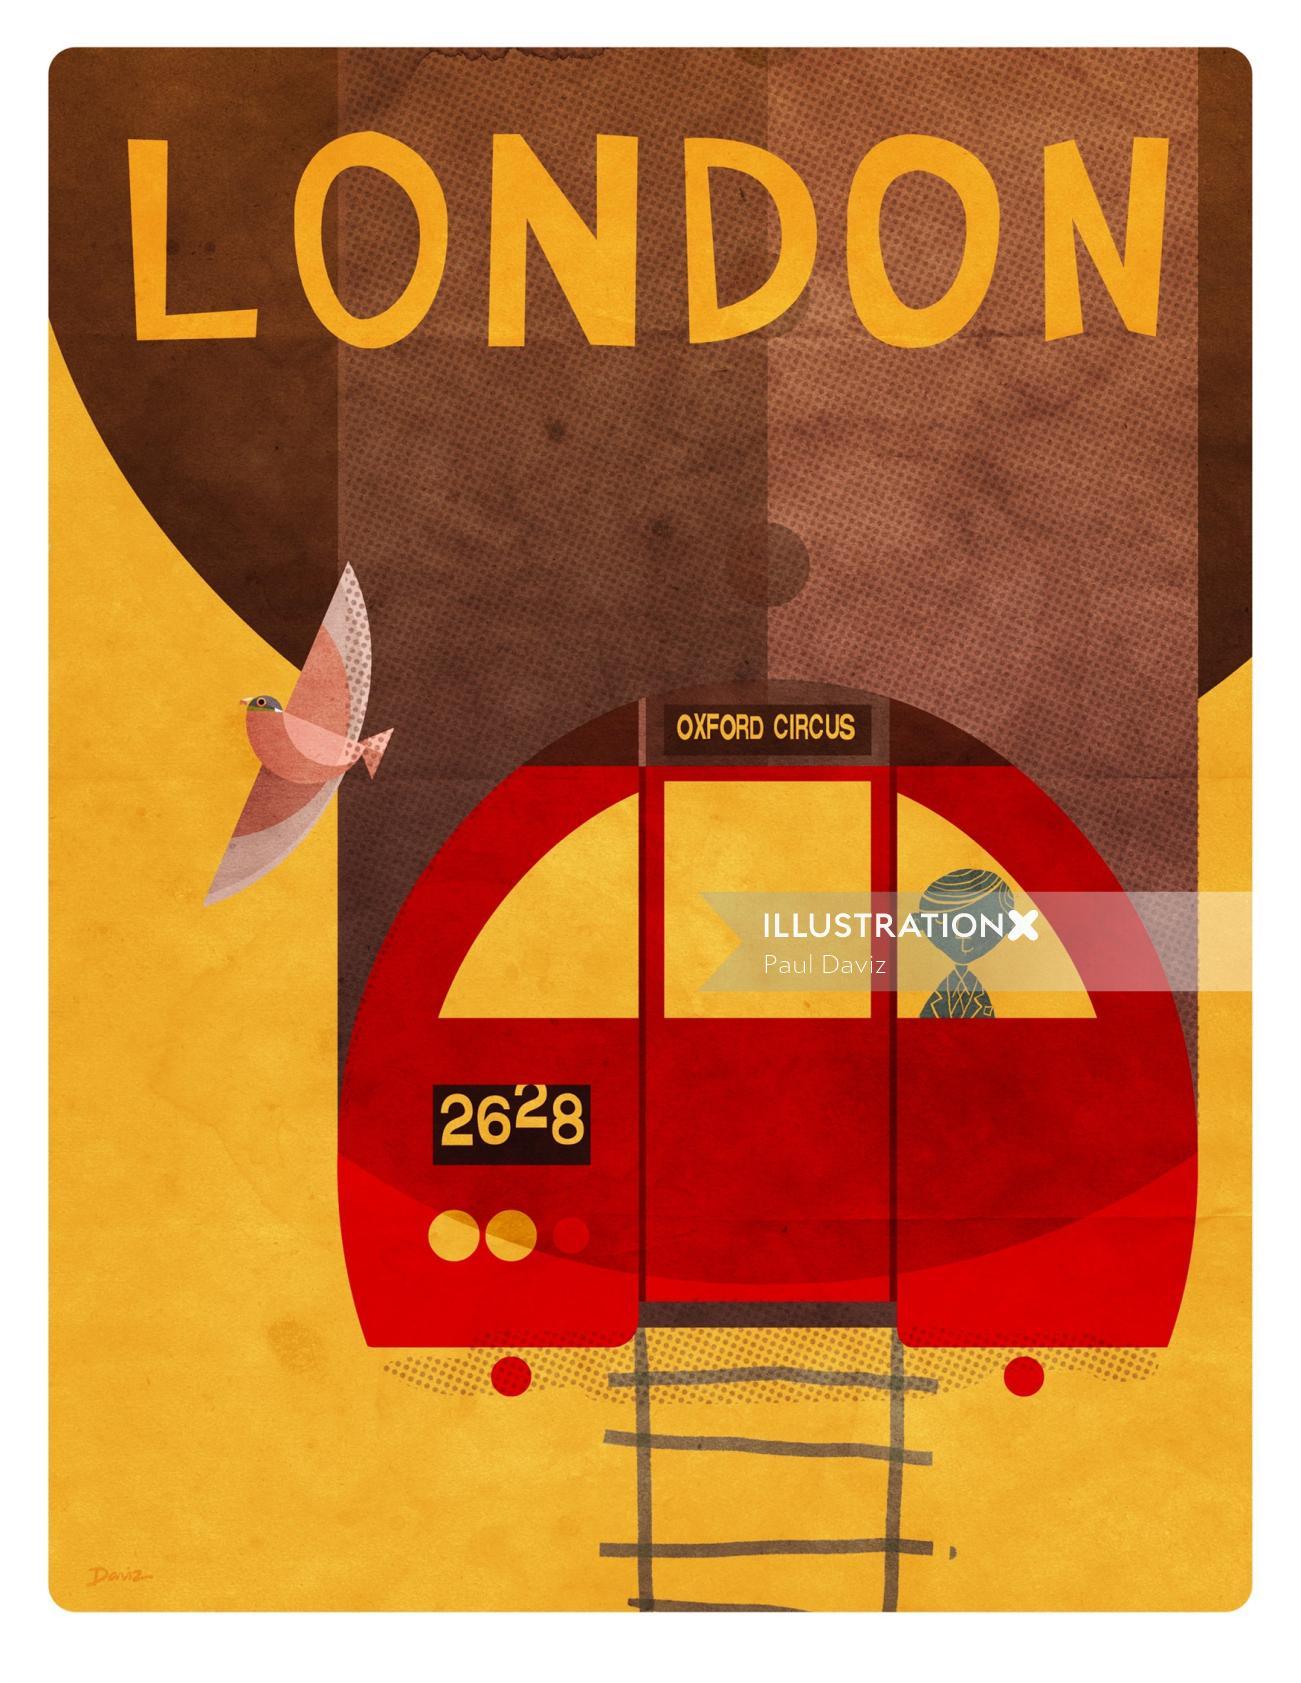 tube illustration by paul daviz